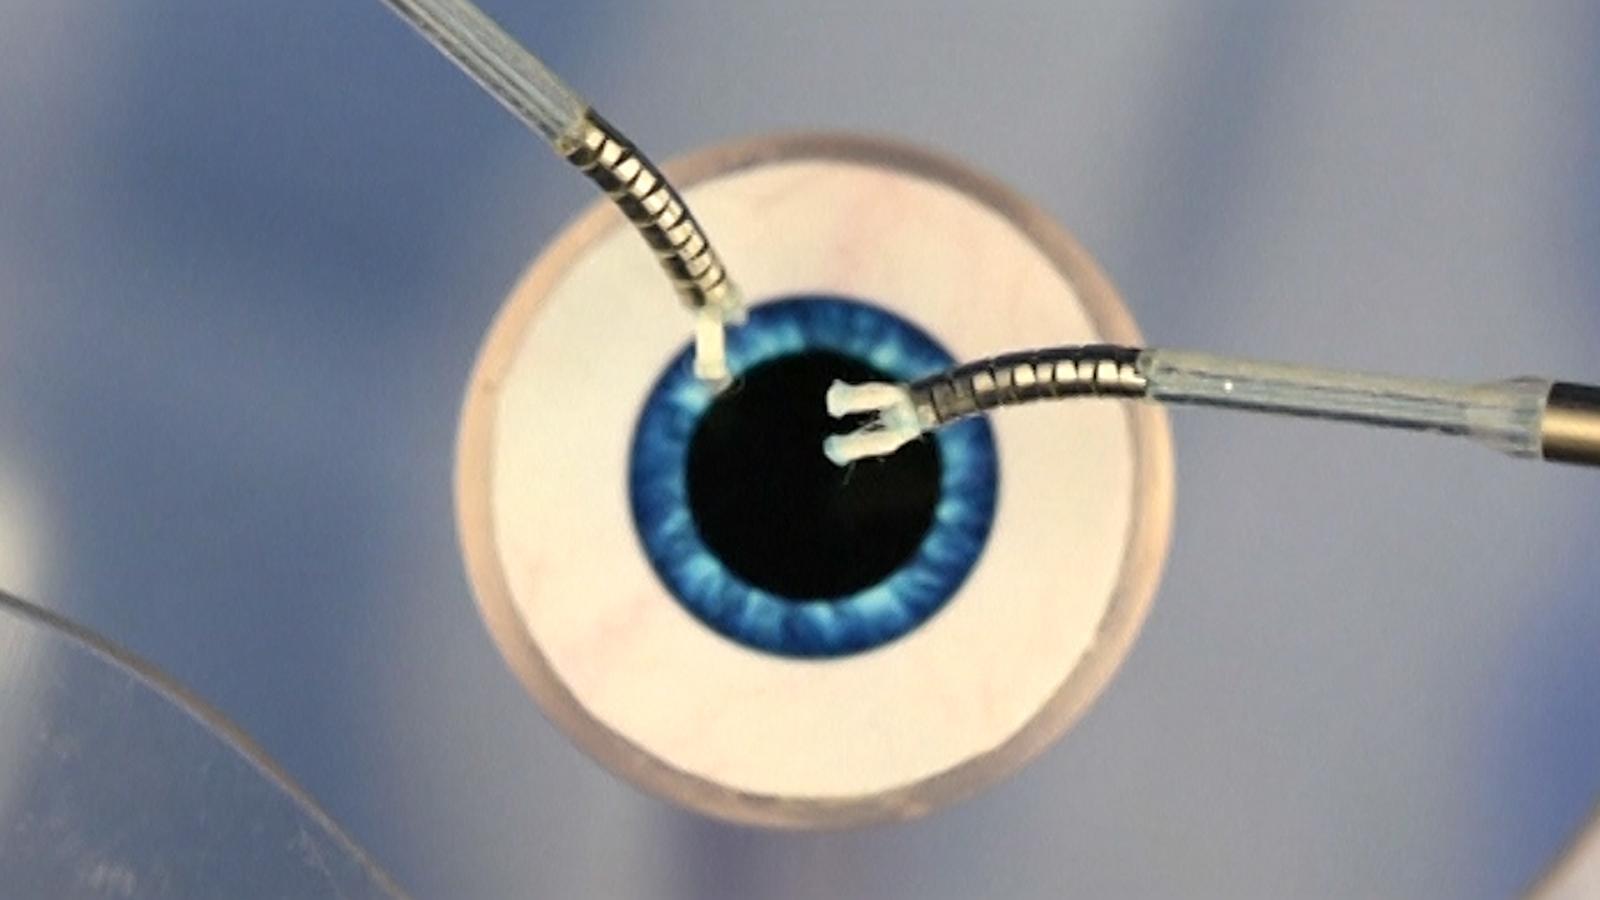 Робот-микрохирург с тентаклями поможет с операциями на глазах